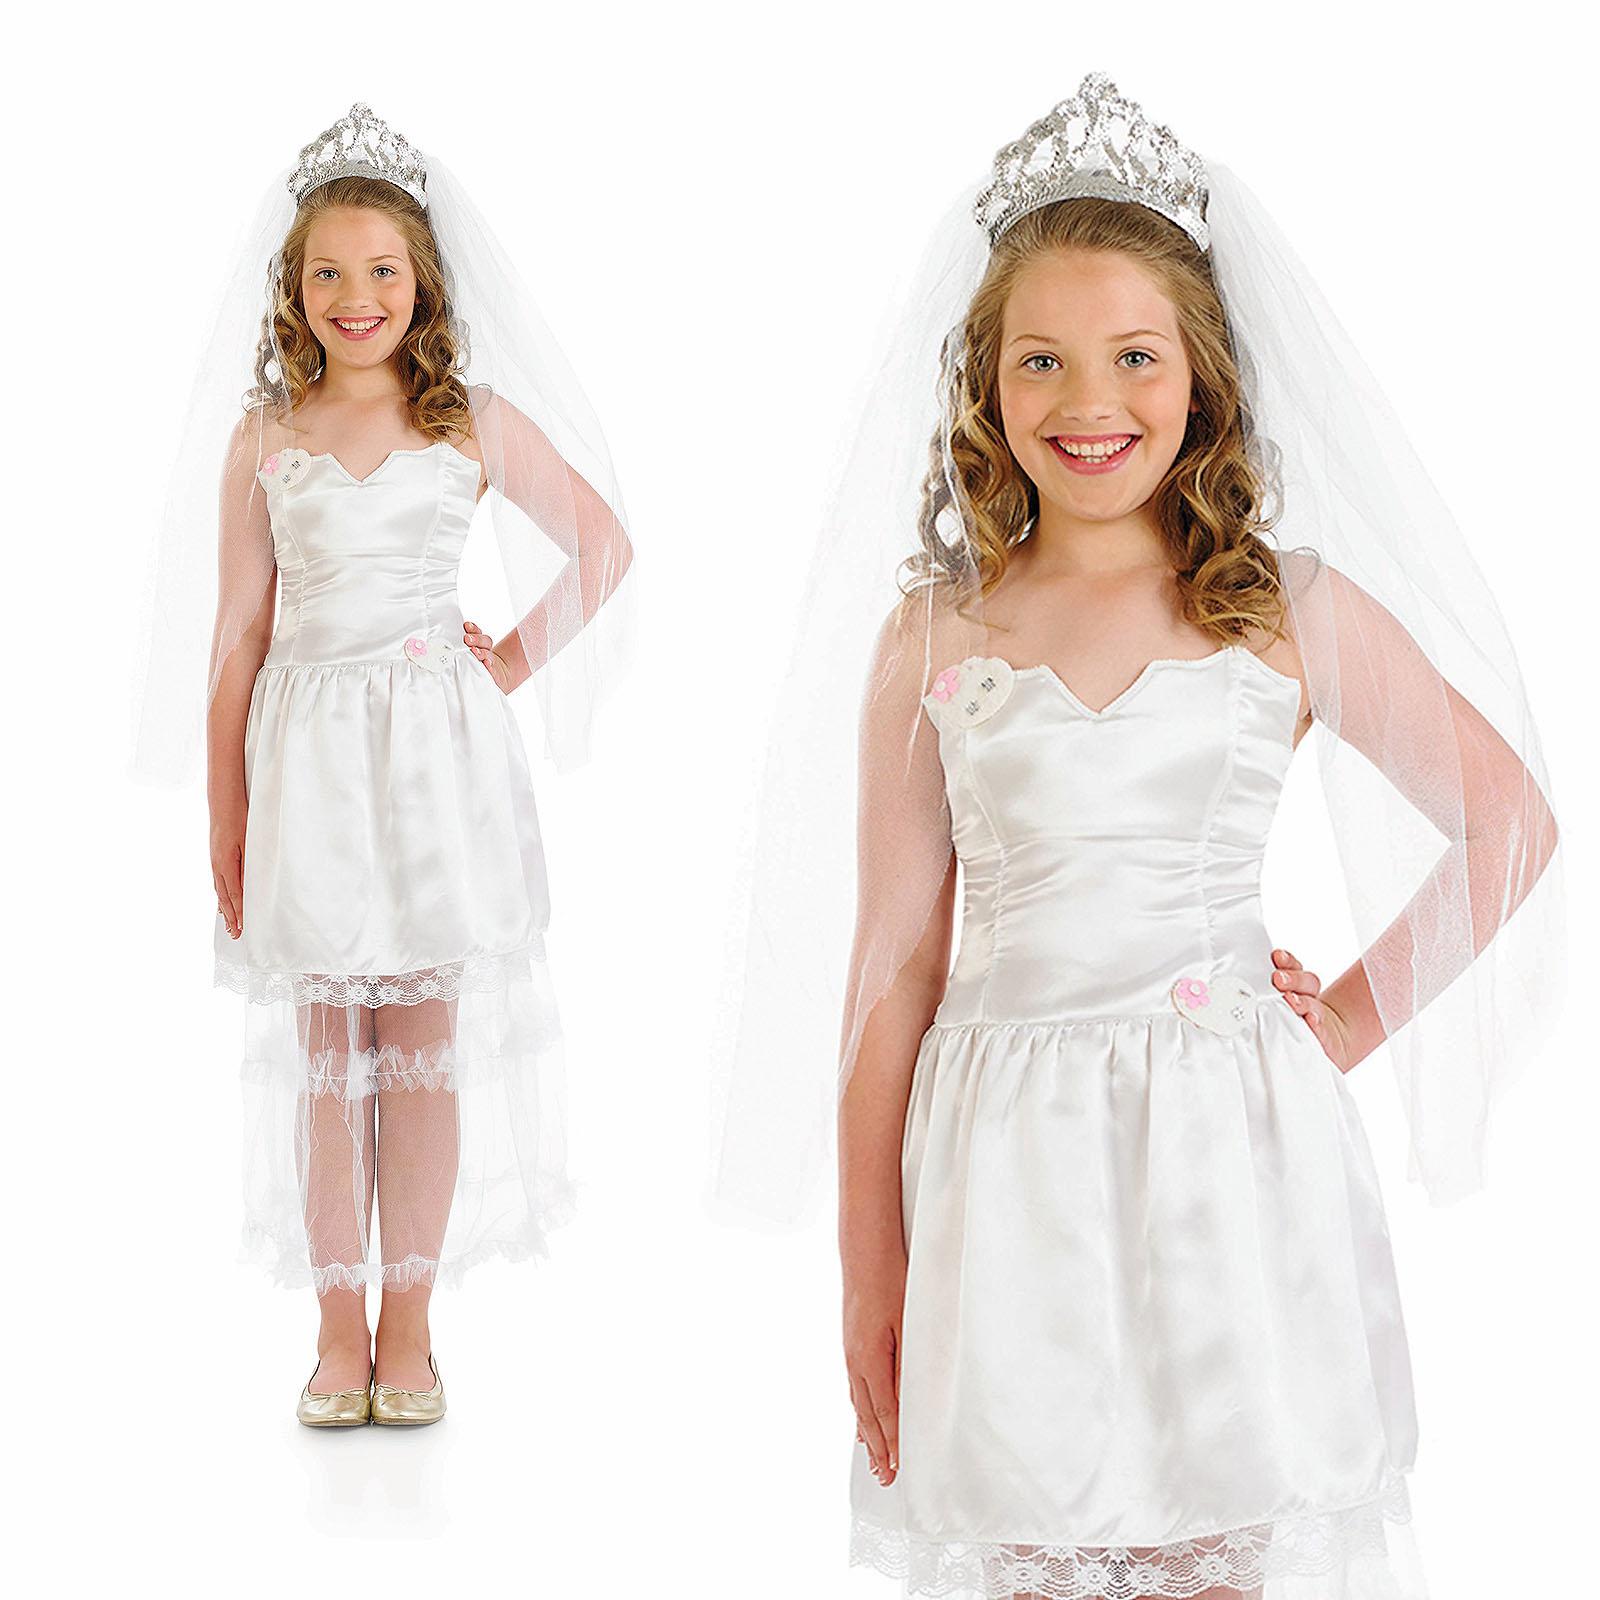 Childrens-Bride-Fancy-Dress-Costume-Wedding-Dress-Bridal-  sc 1 st  eBay & Childrens Bride Fancy Dress Costume Wedding Dress Bridal Kids Outfit ...